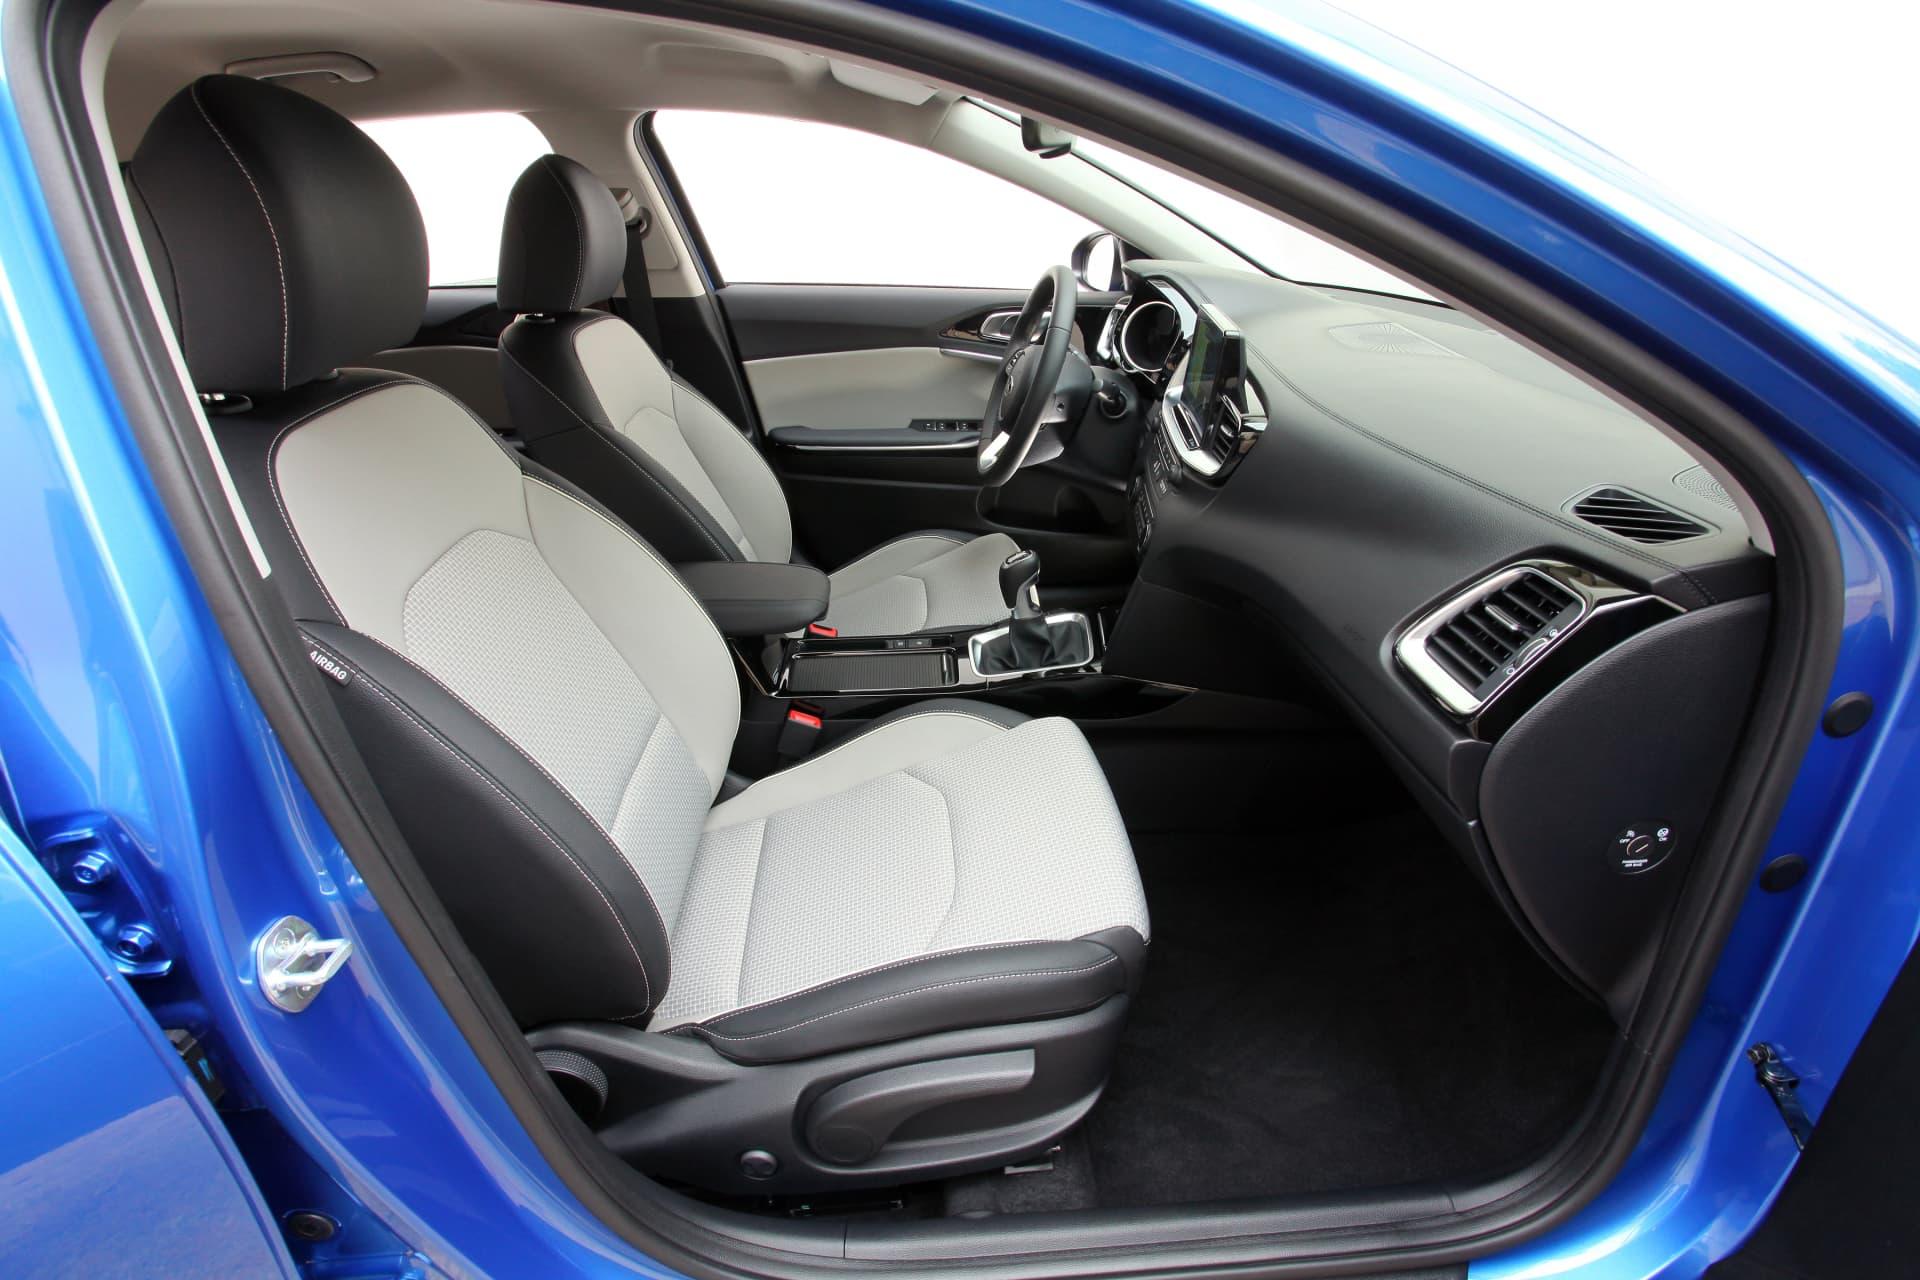 Kia Ceed 1 6 Crdi 6mt Transmission 136hp Blue Flame 31